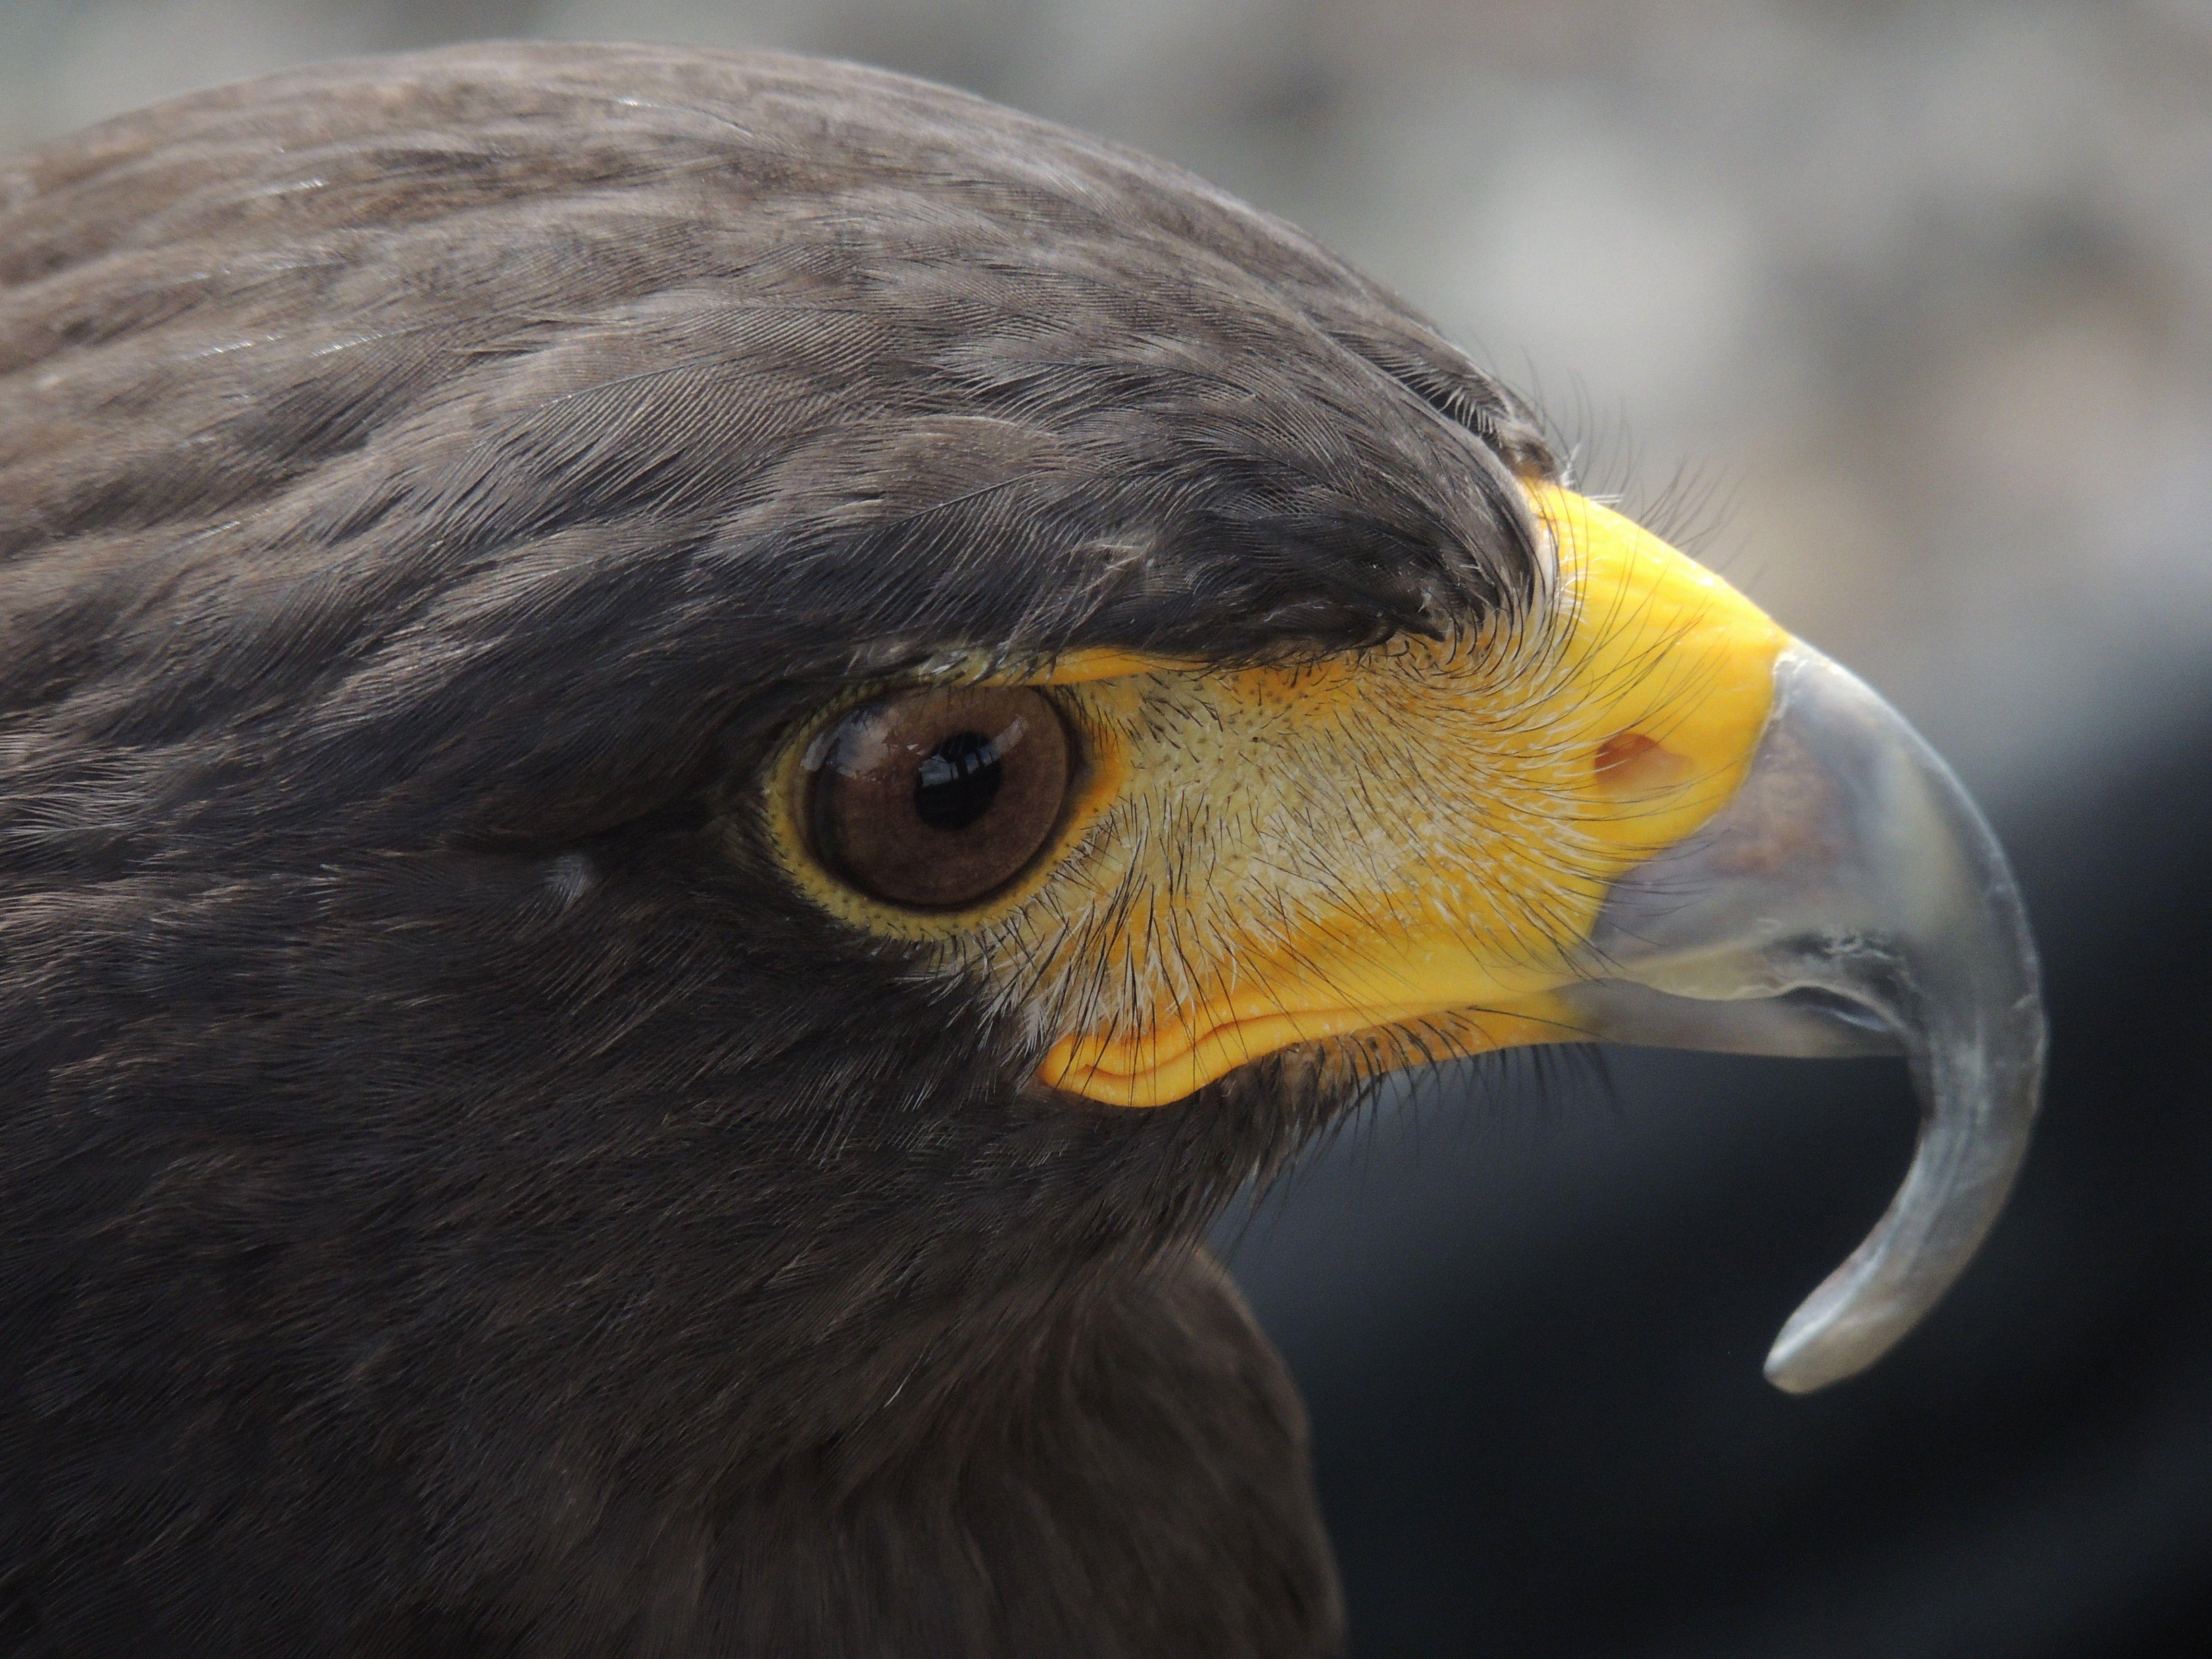 Bald eagle bird wallpaper iphone 7 download high resolutuion hd bald eagle bird wallpaper iphone 7 download high resolutuion voltagebd Image collections